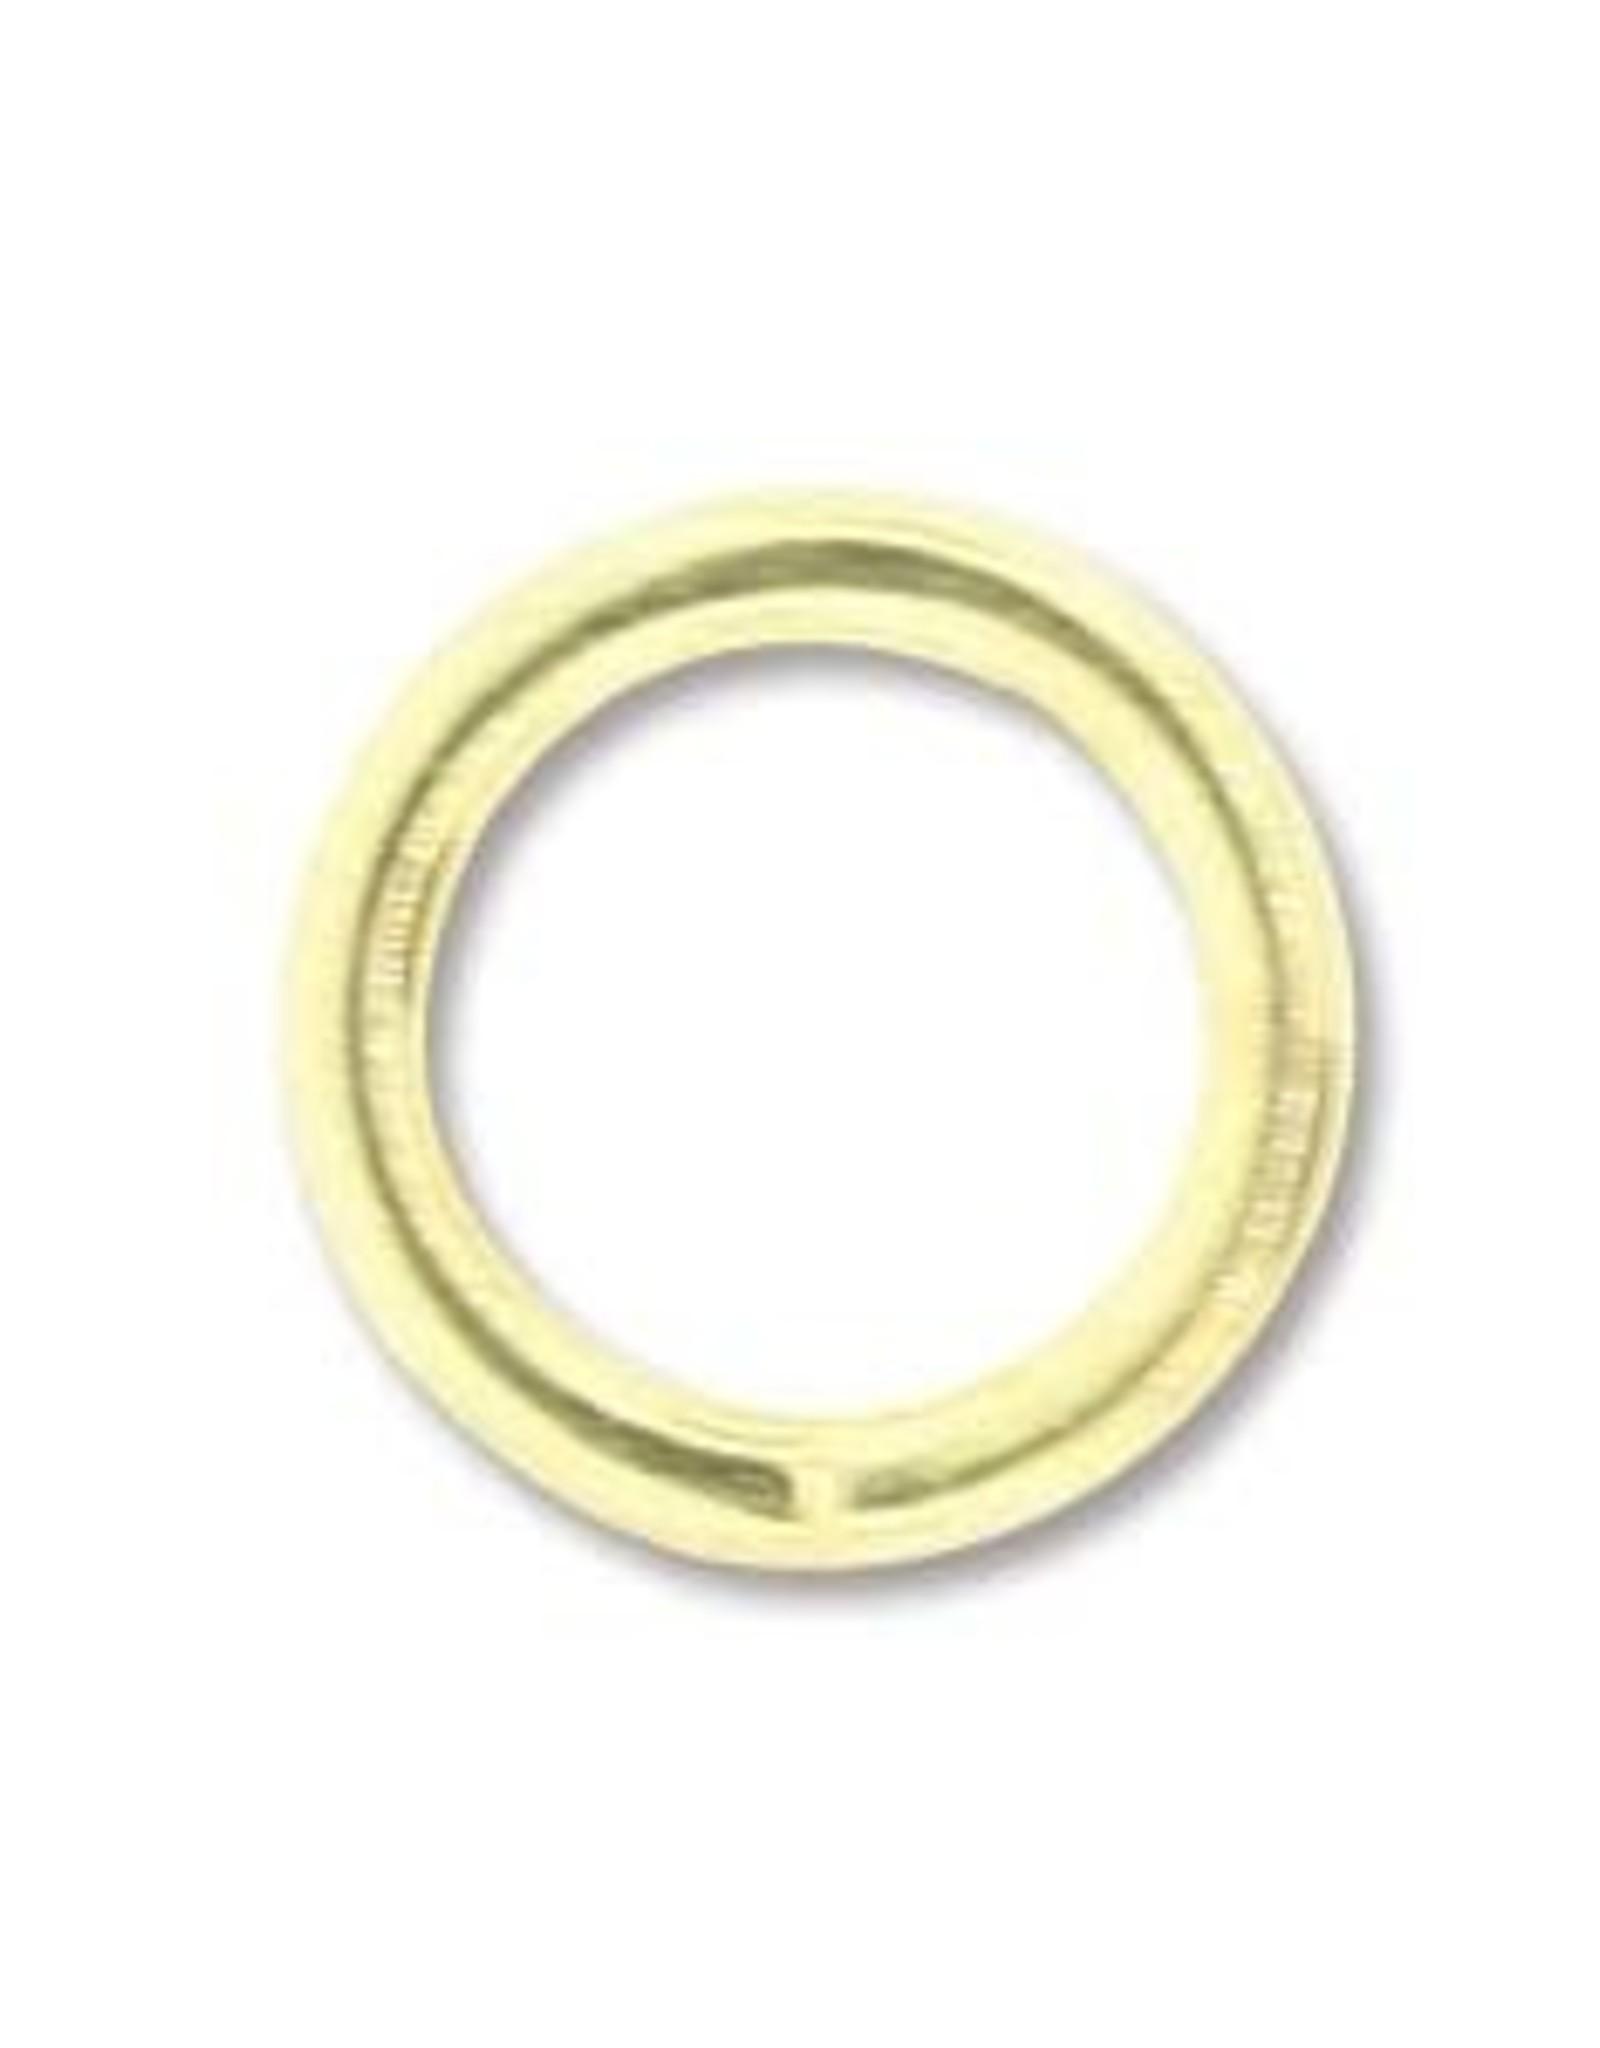 5mm Jump Ring 20ga Gold Plate Qty 144